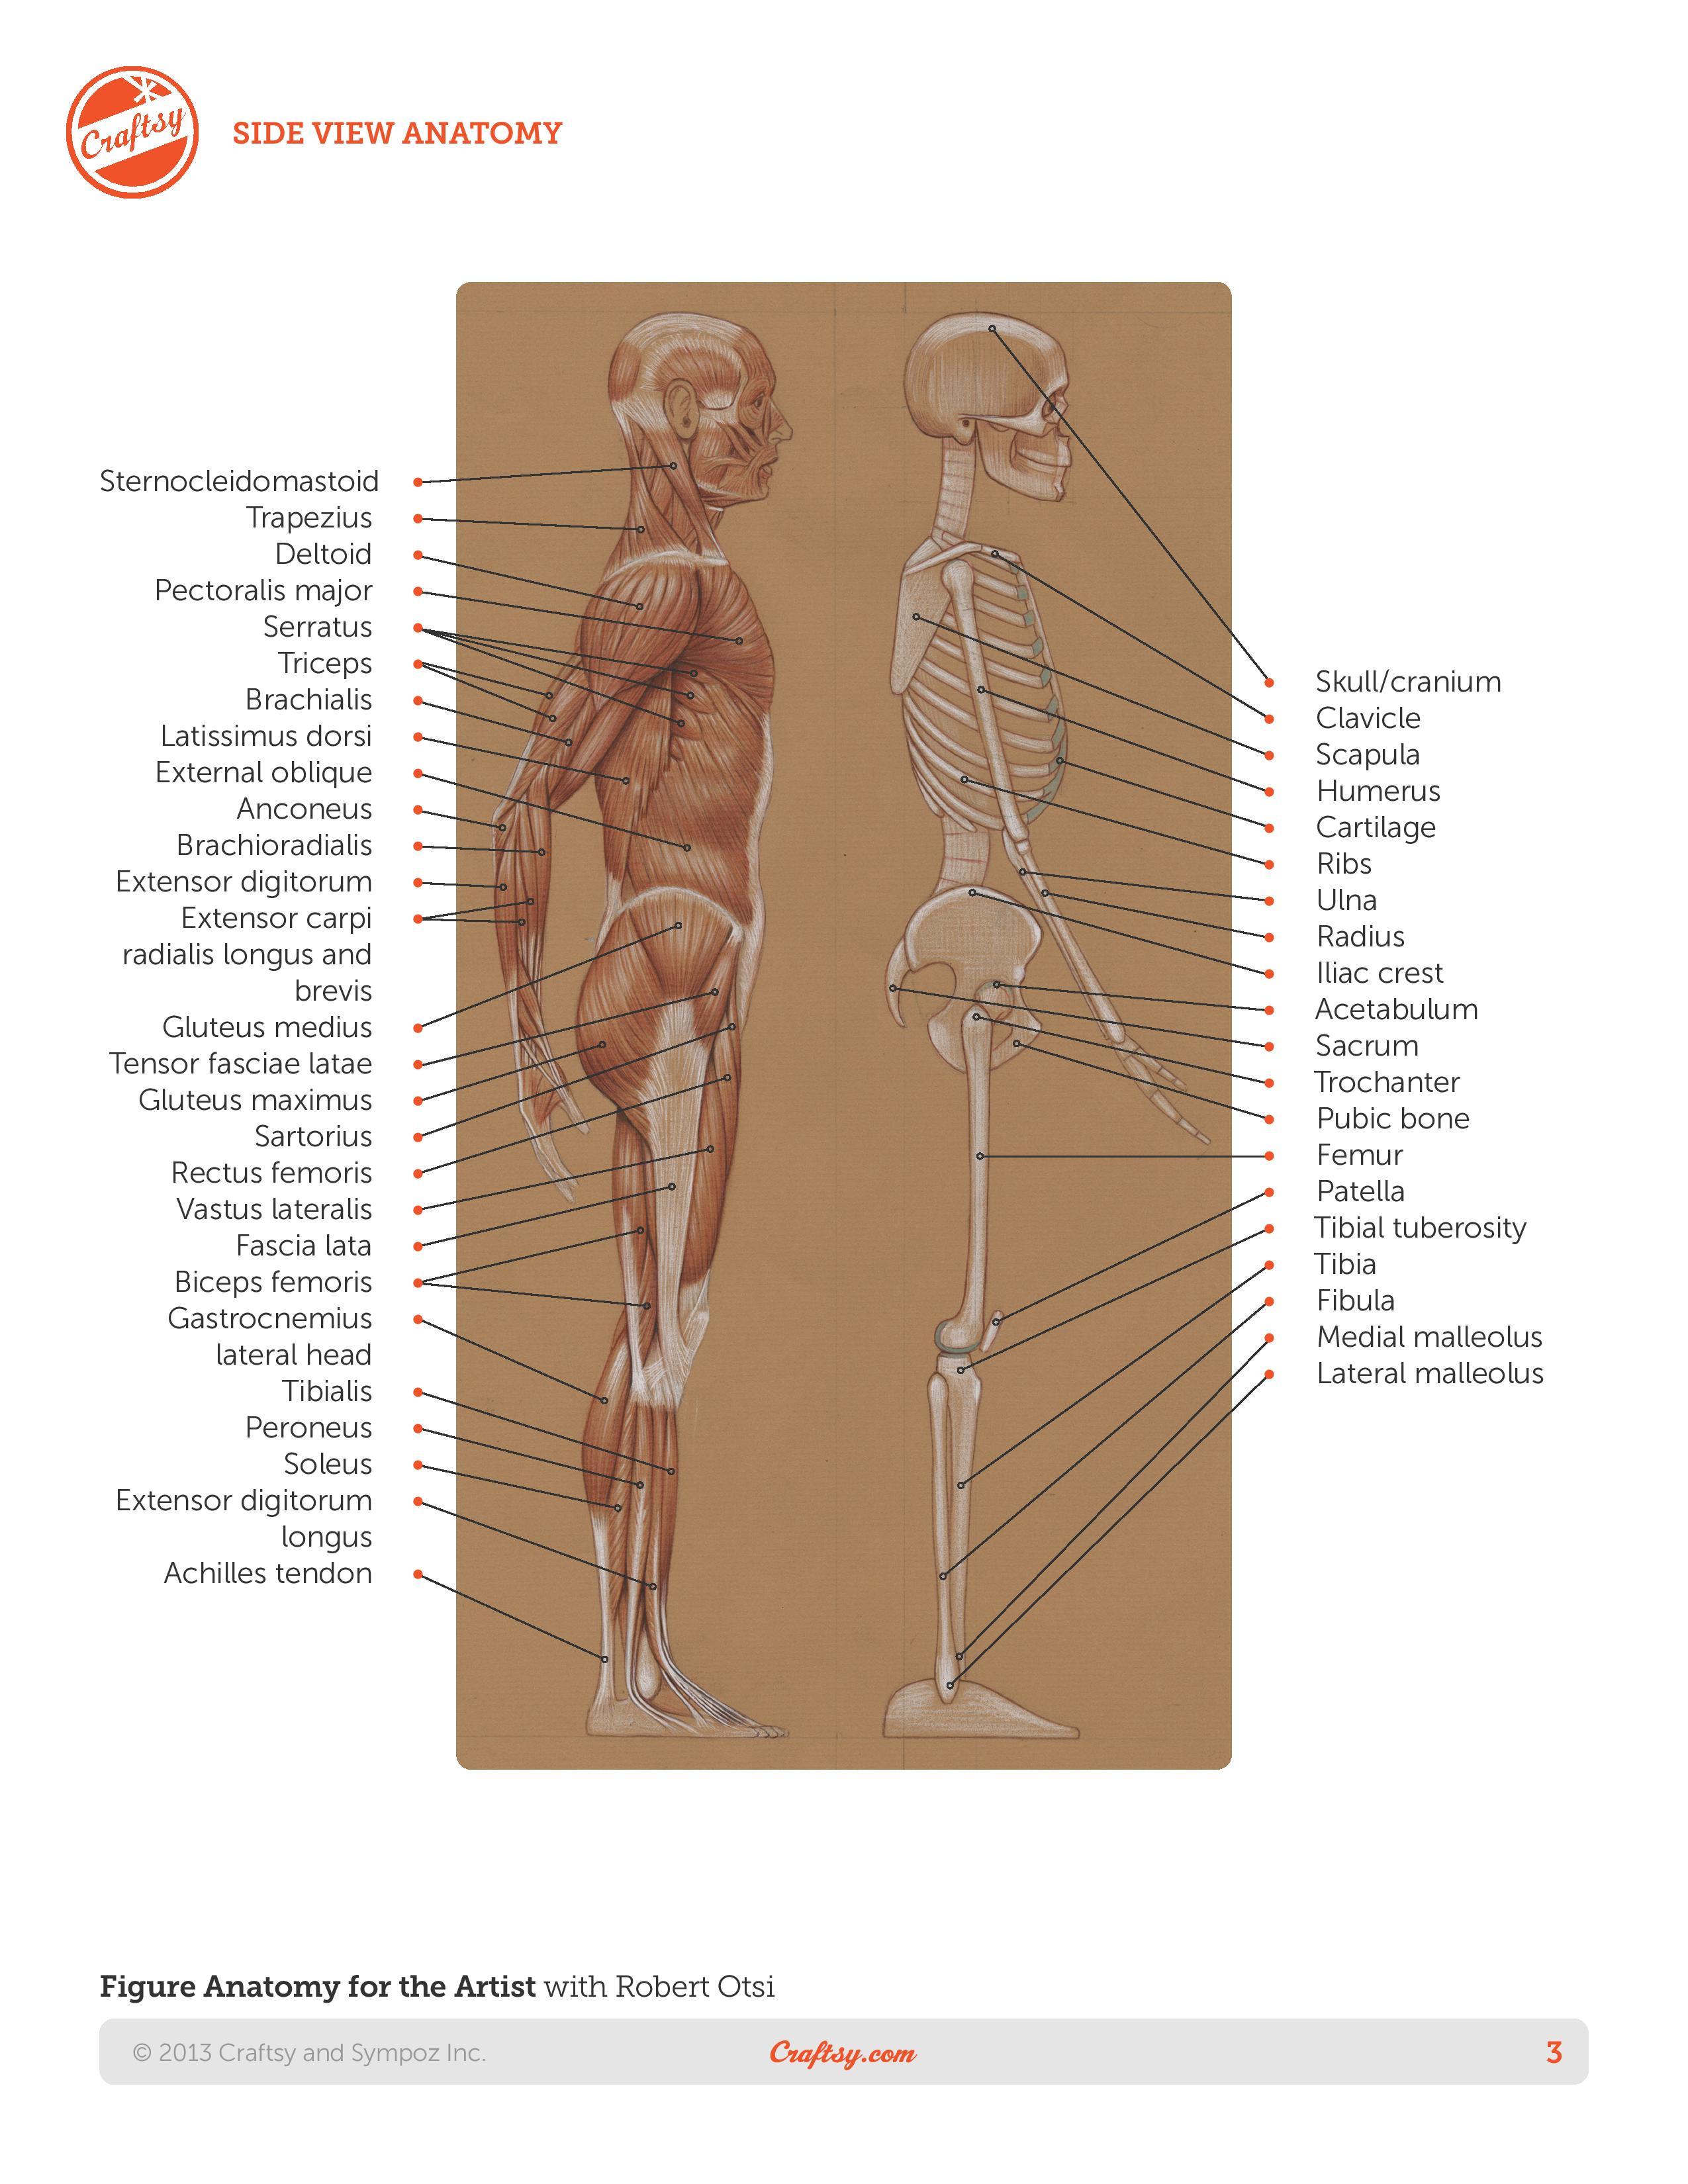 Roberto-Osti-book-Basic-human-anatomy-page-3